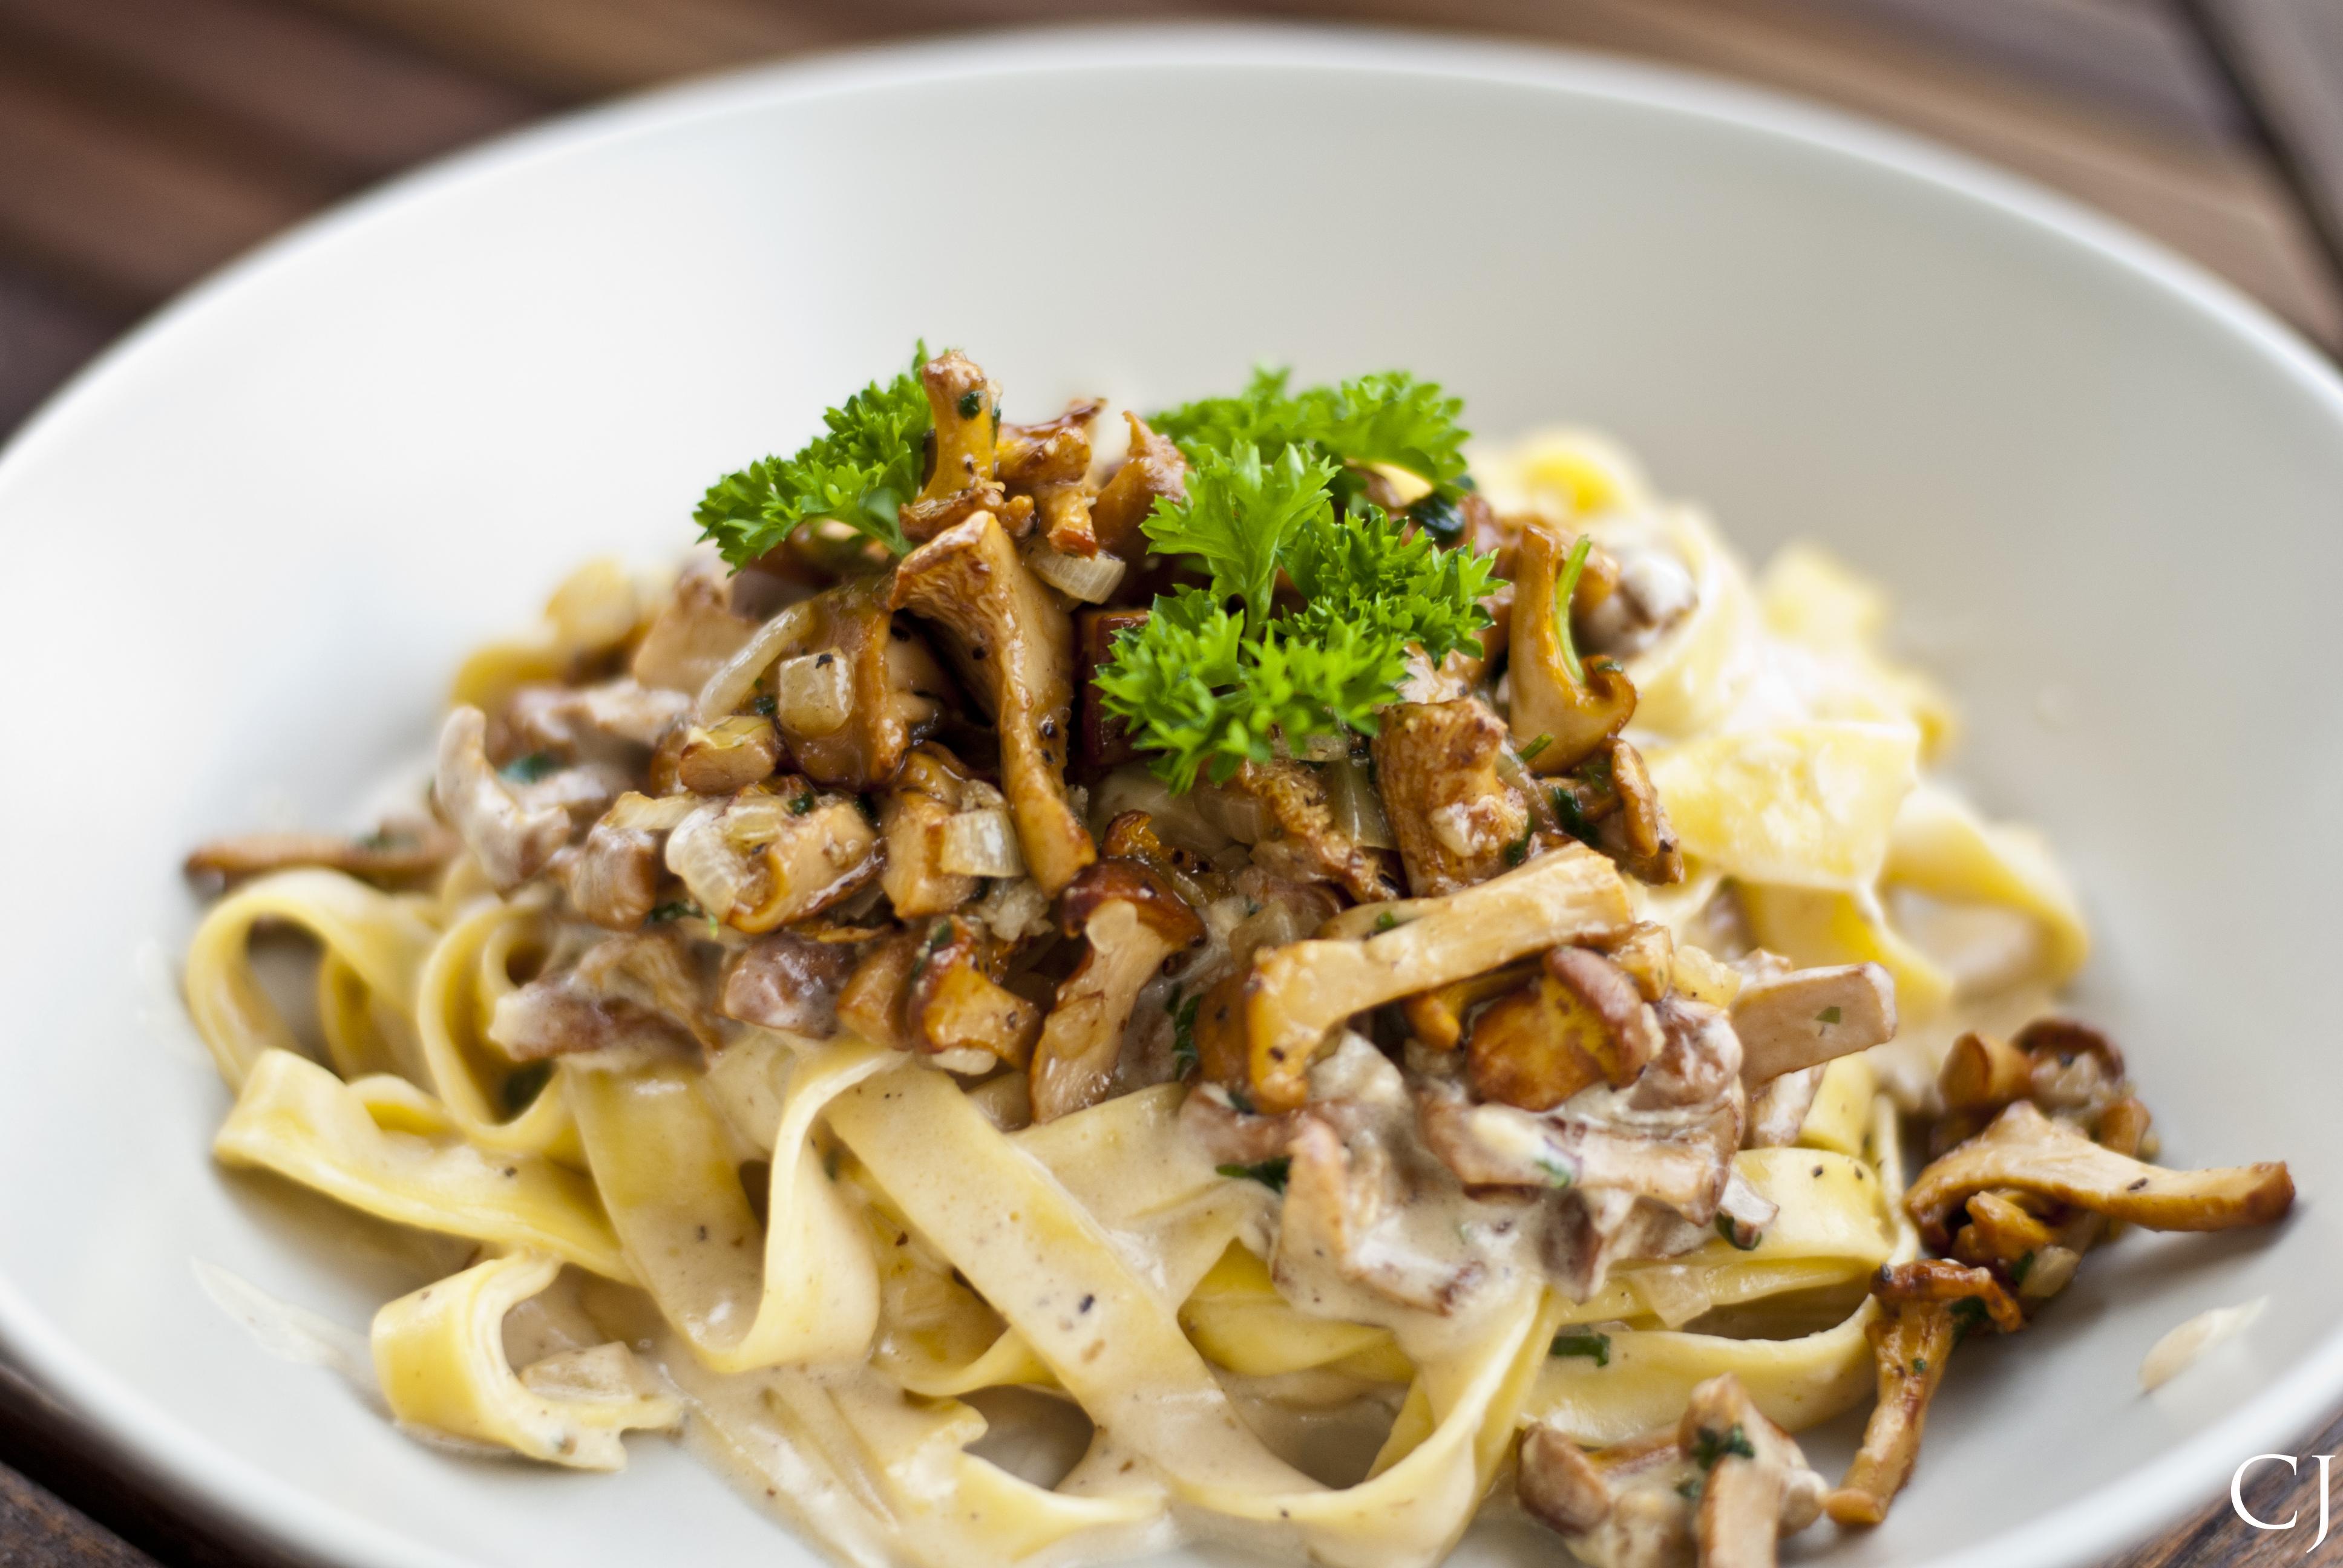 Mushroom pasta v.2 by CJacobssonFoto